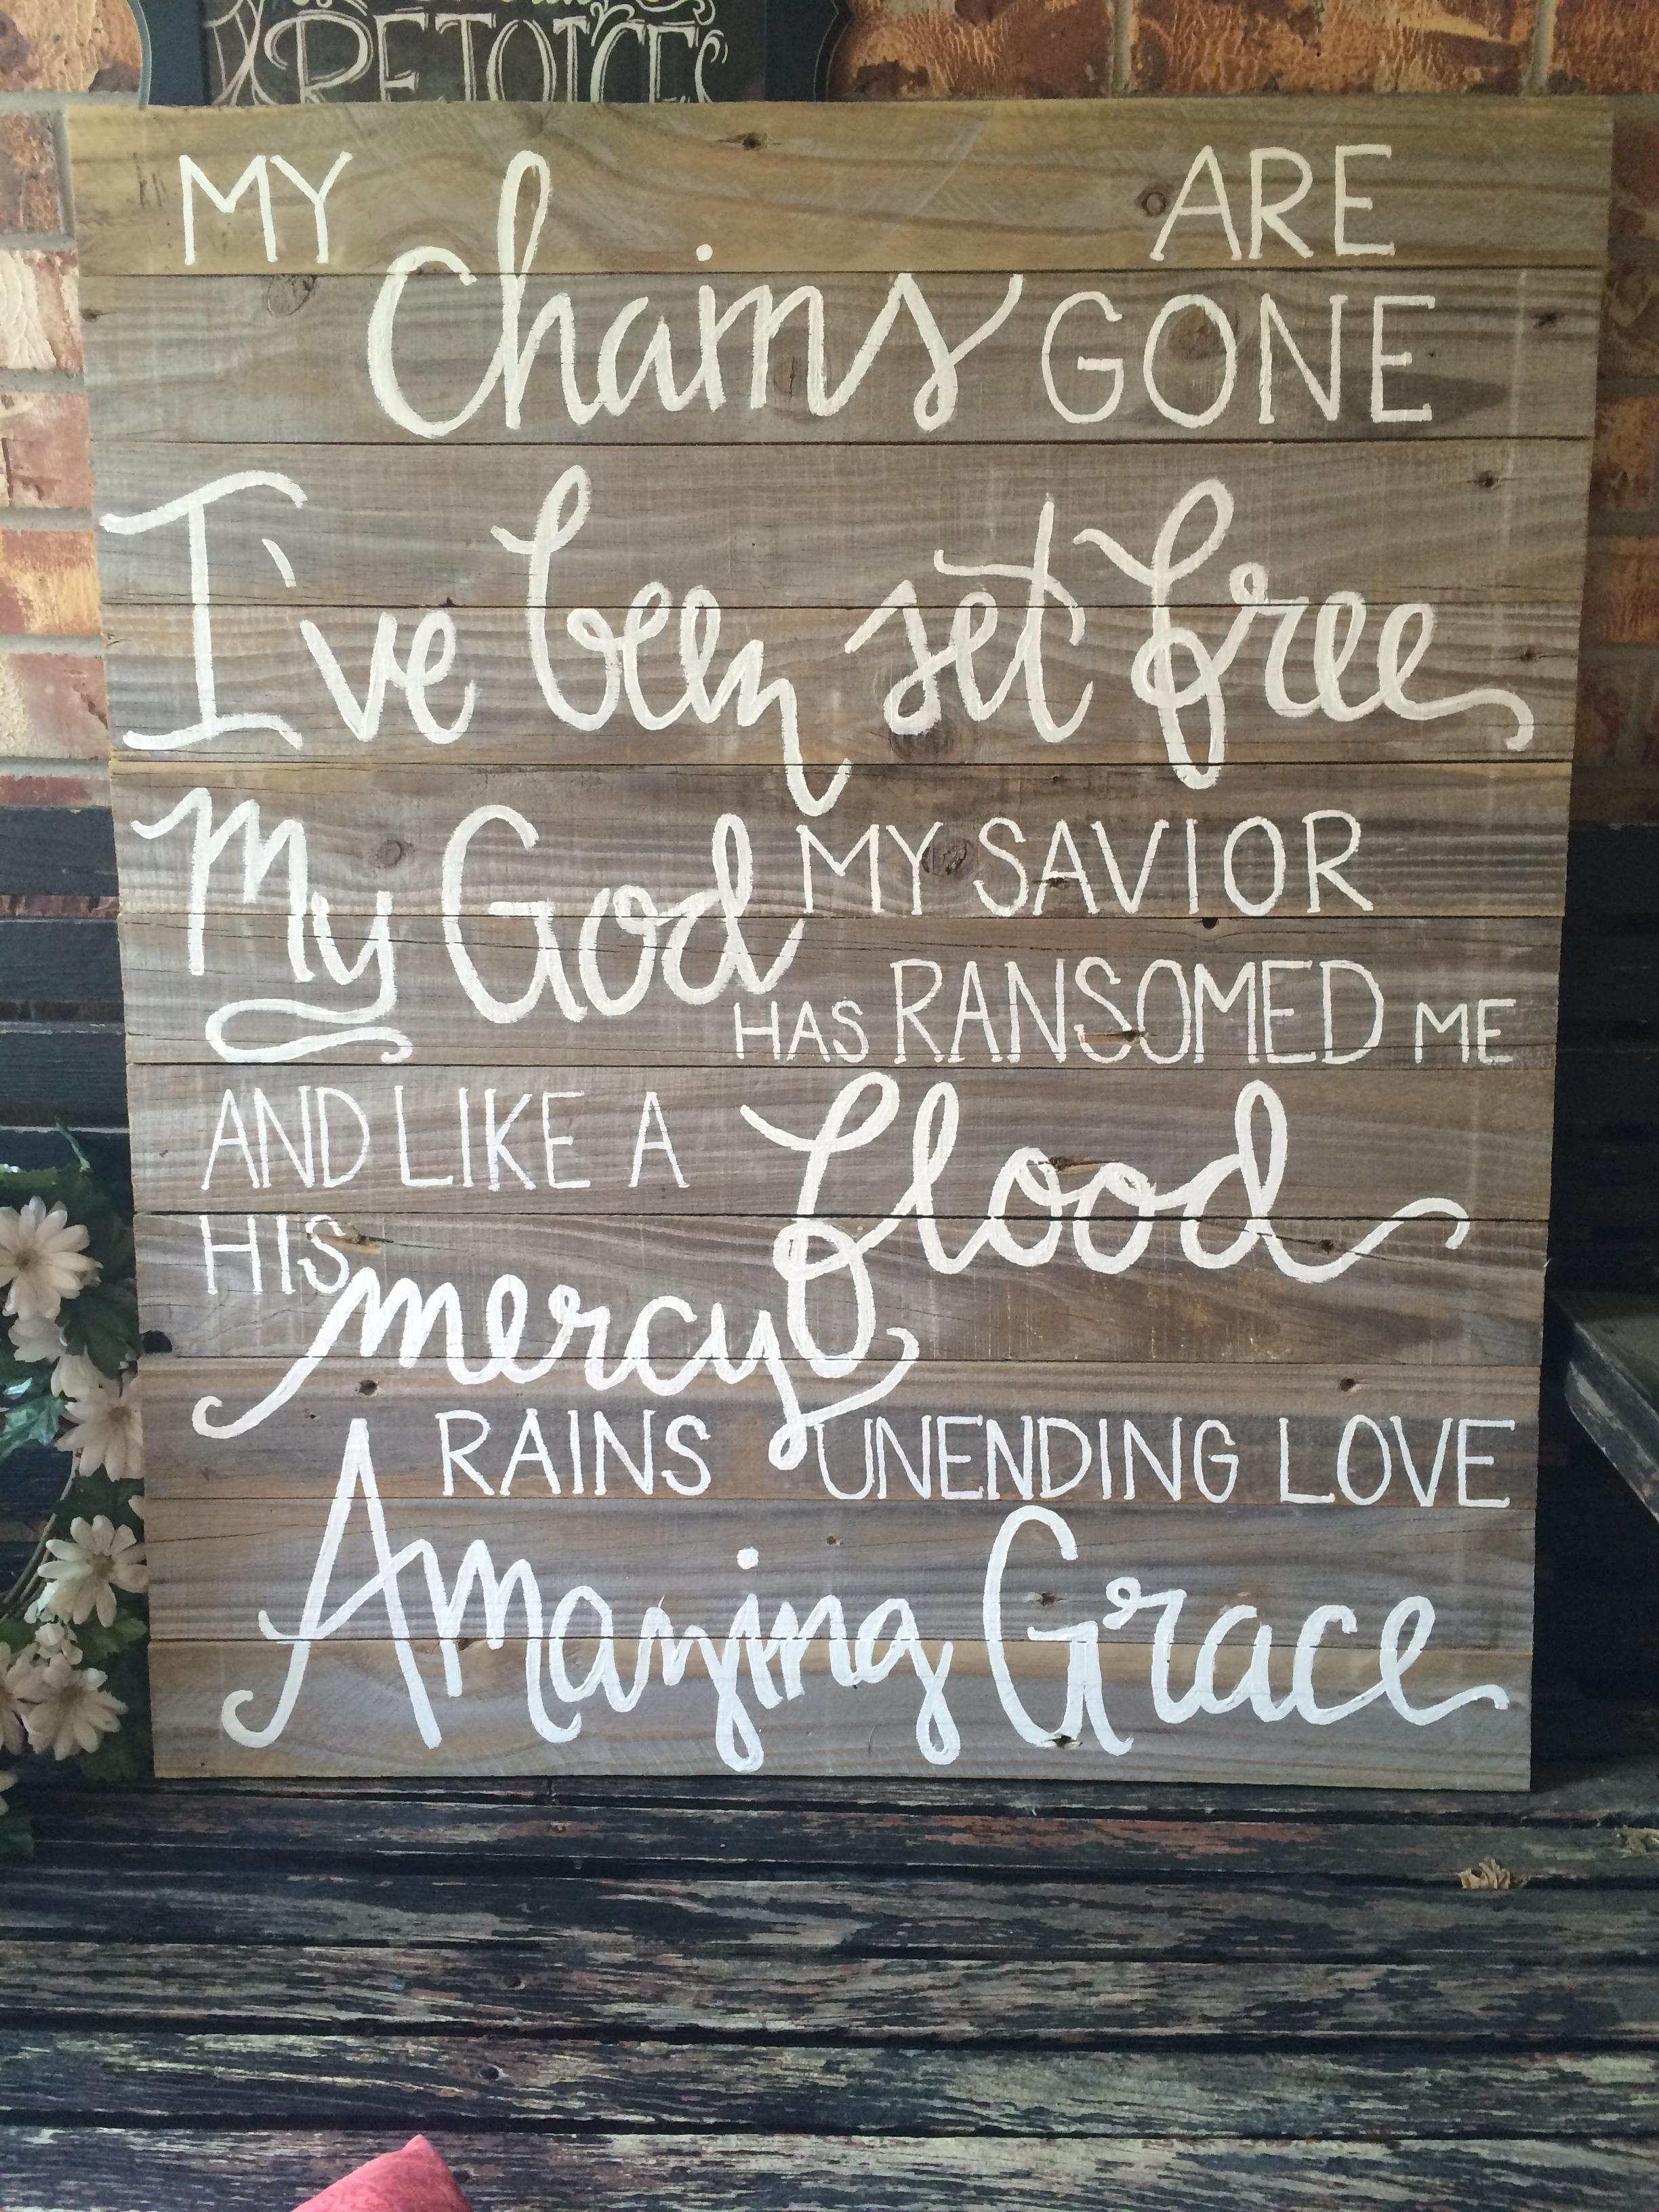 Amazing Grace 3.jpg